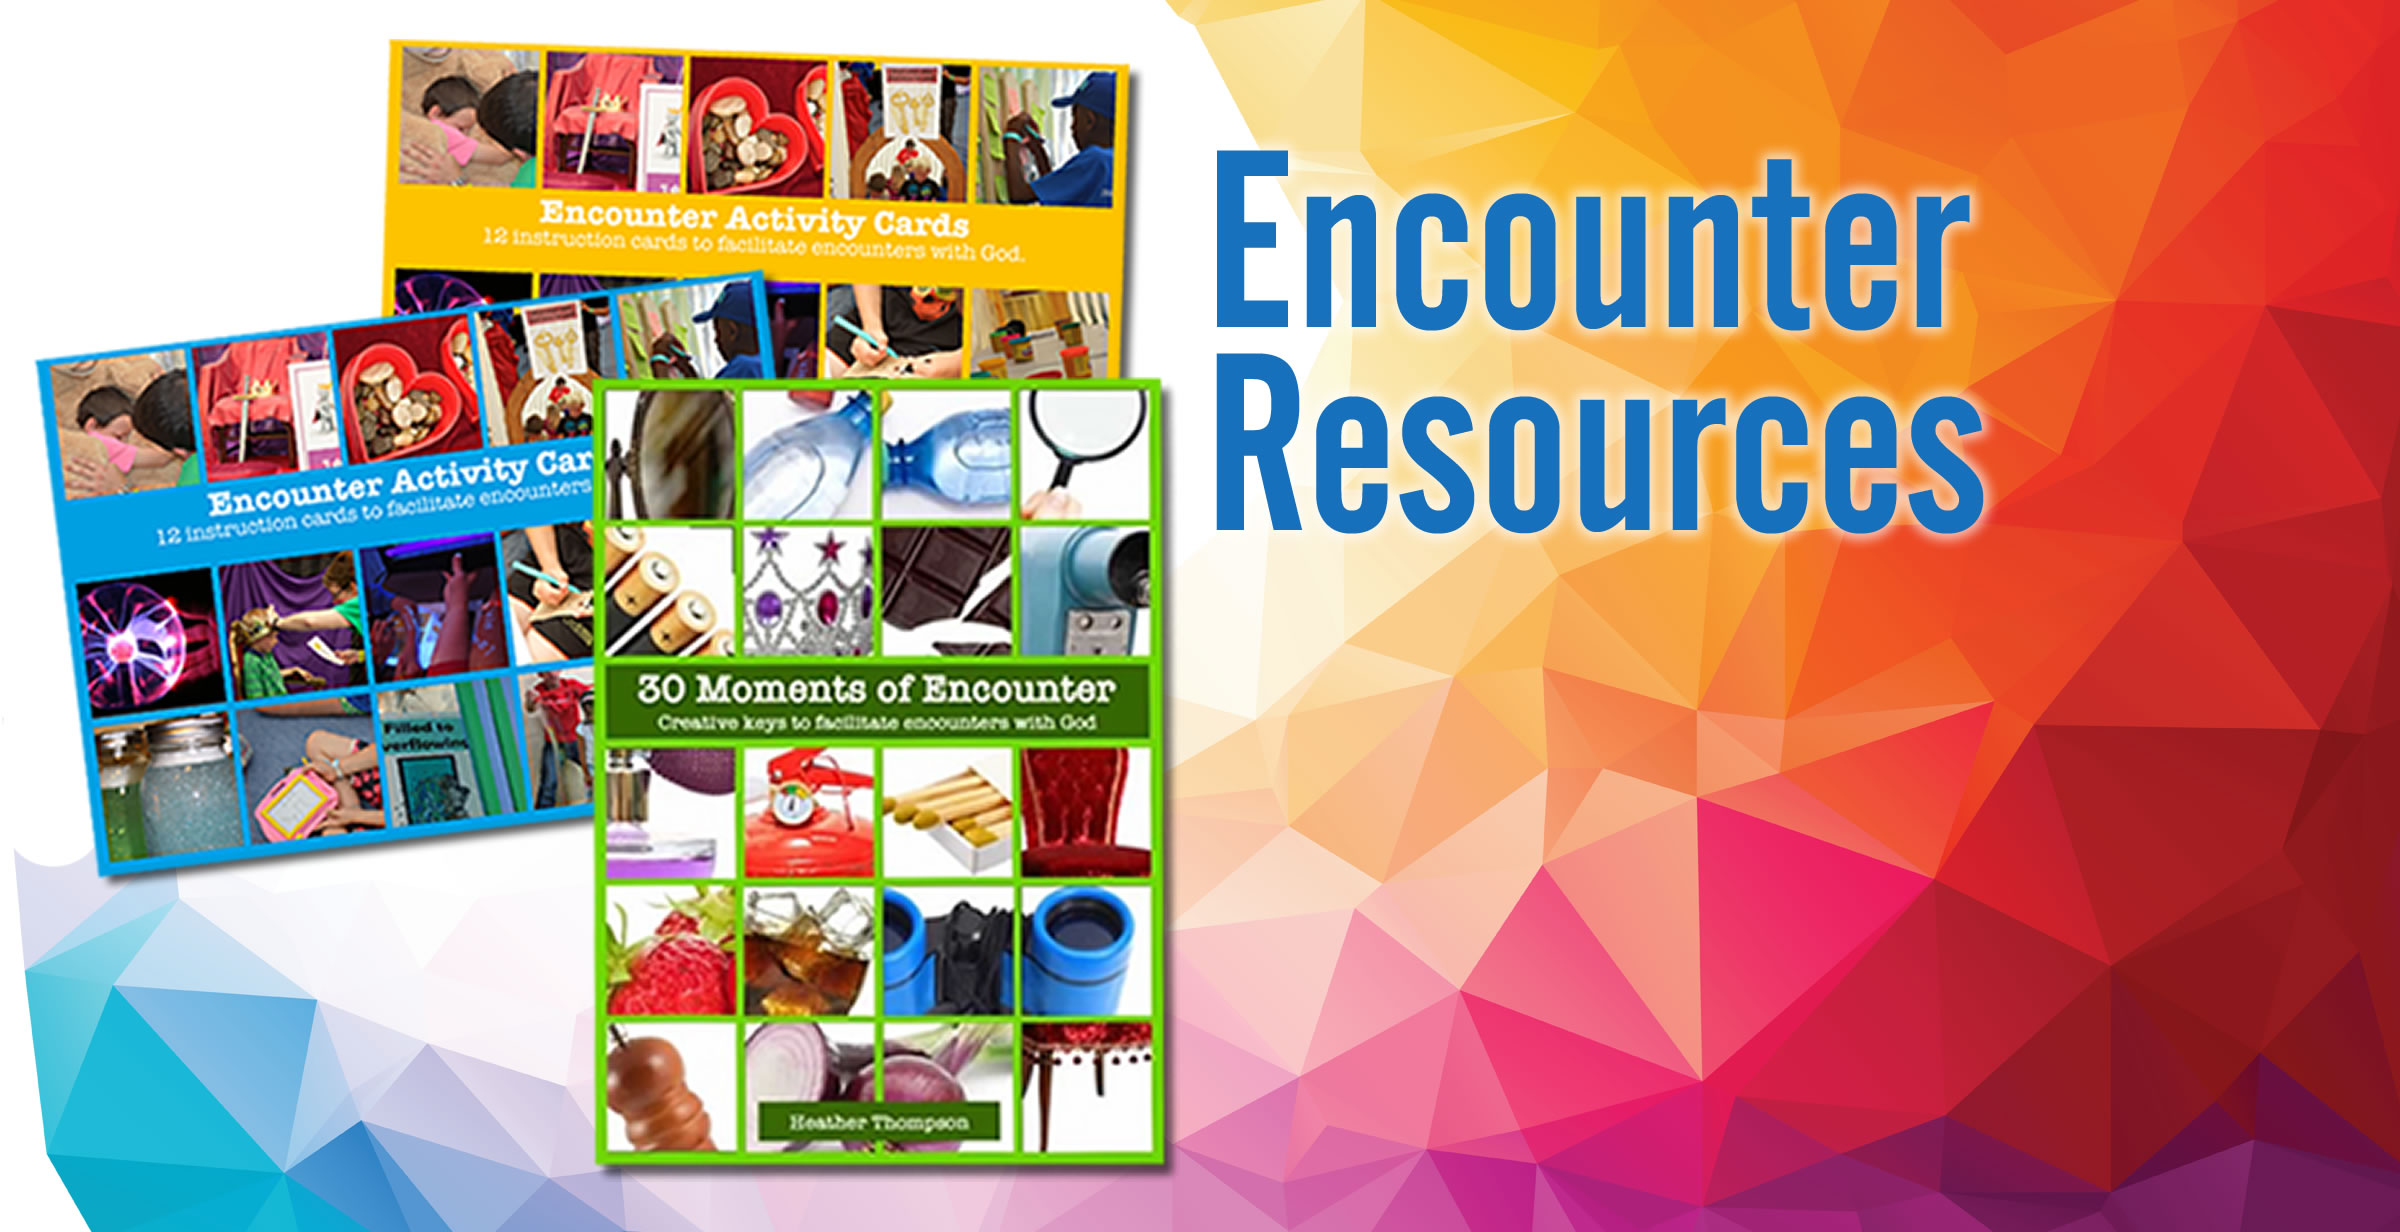 Encounter Resources